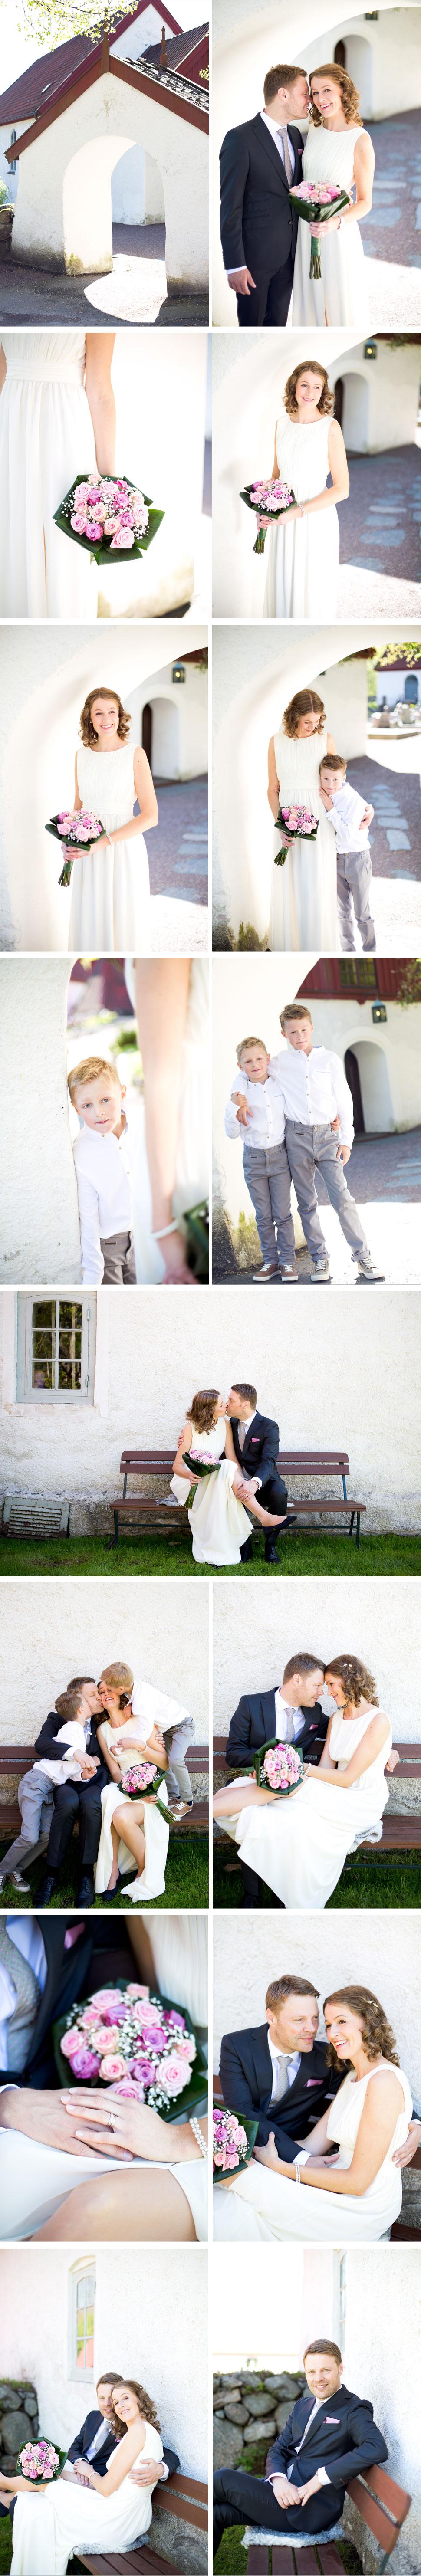 BröllopKållered